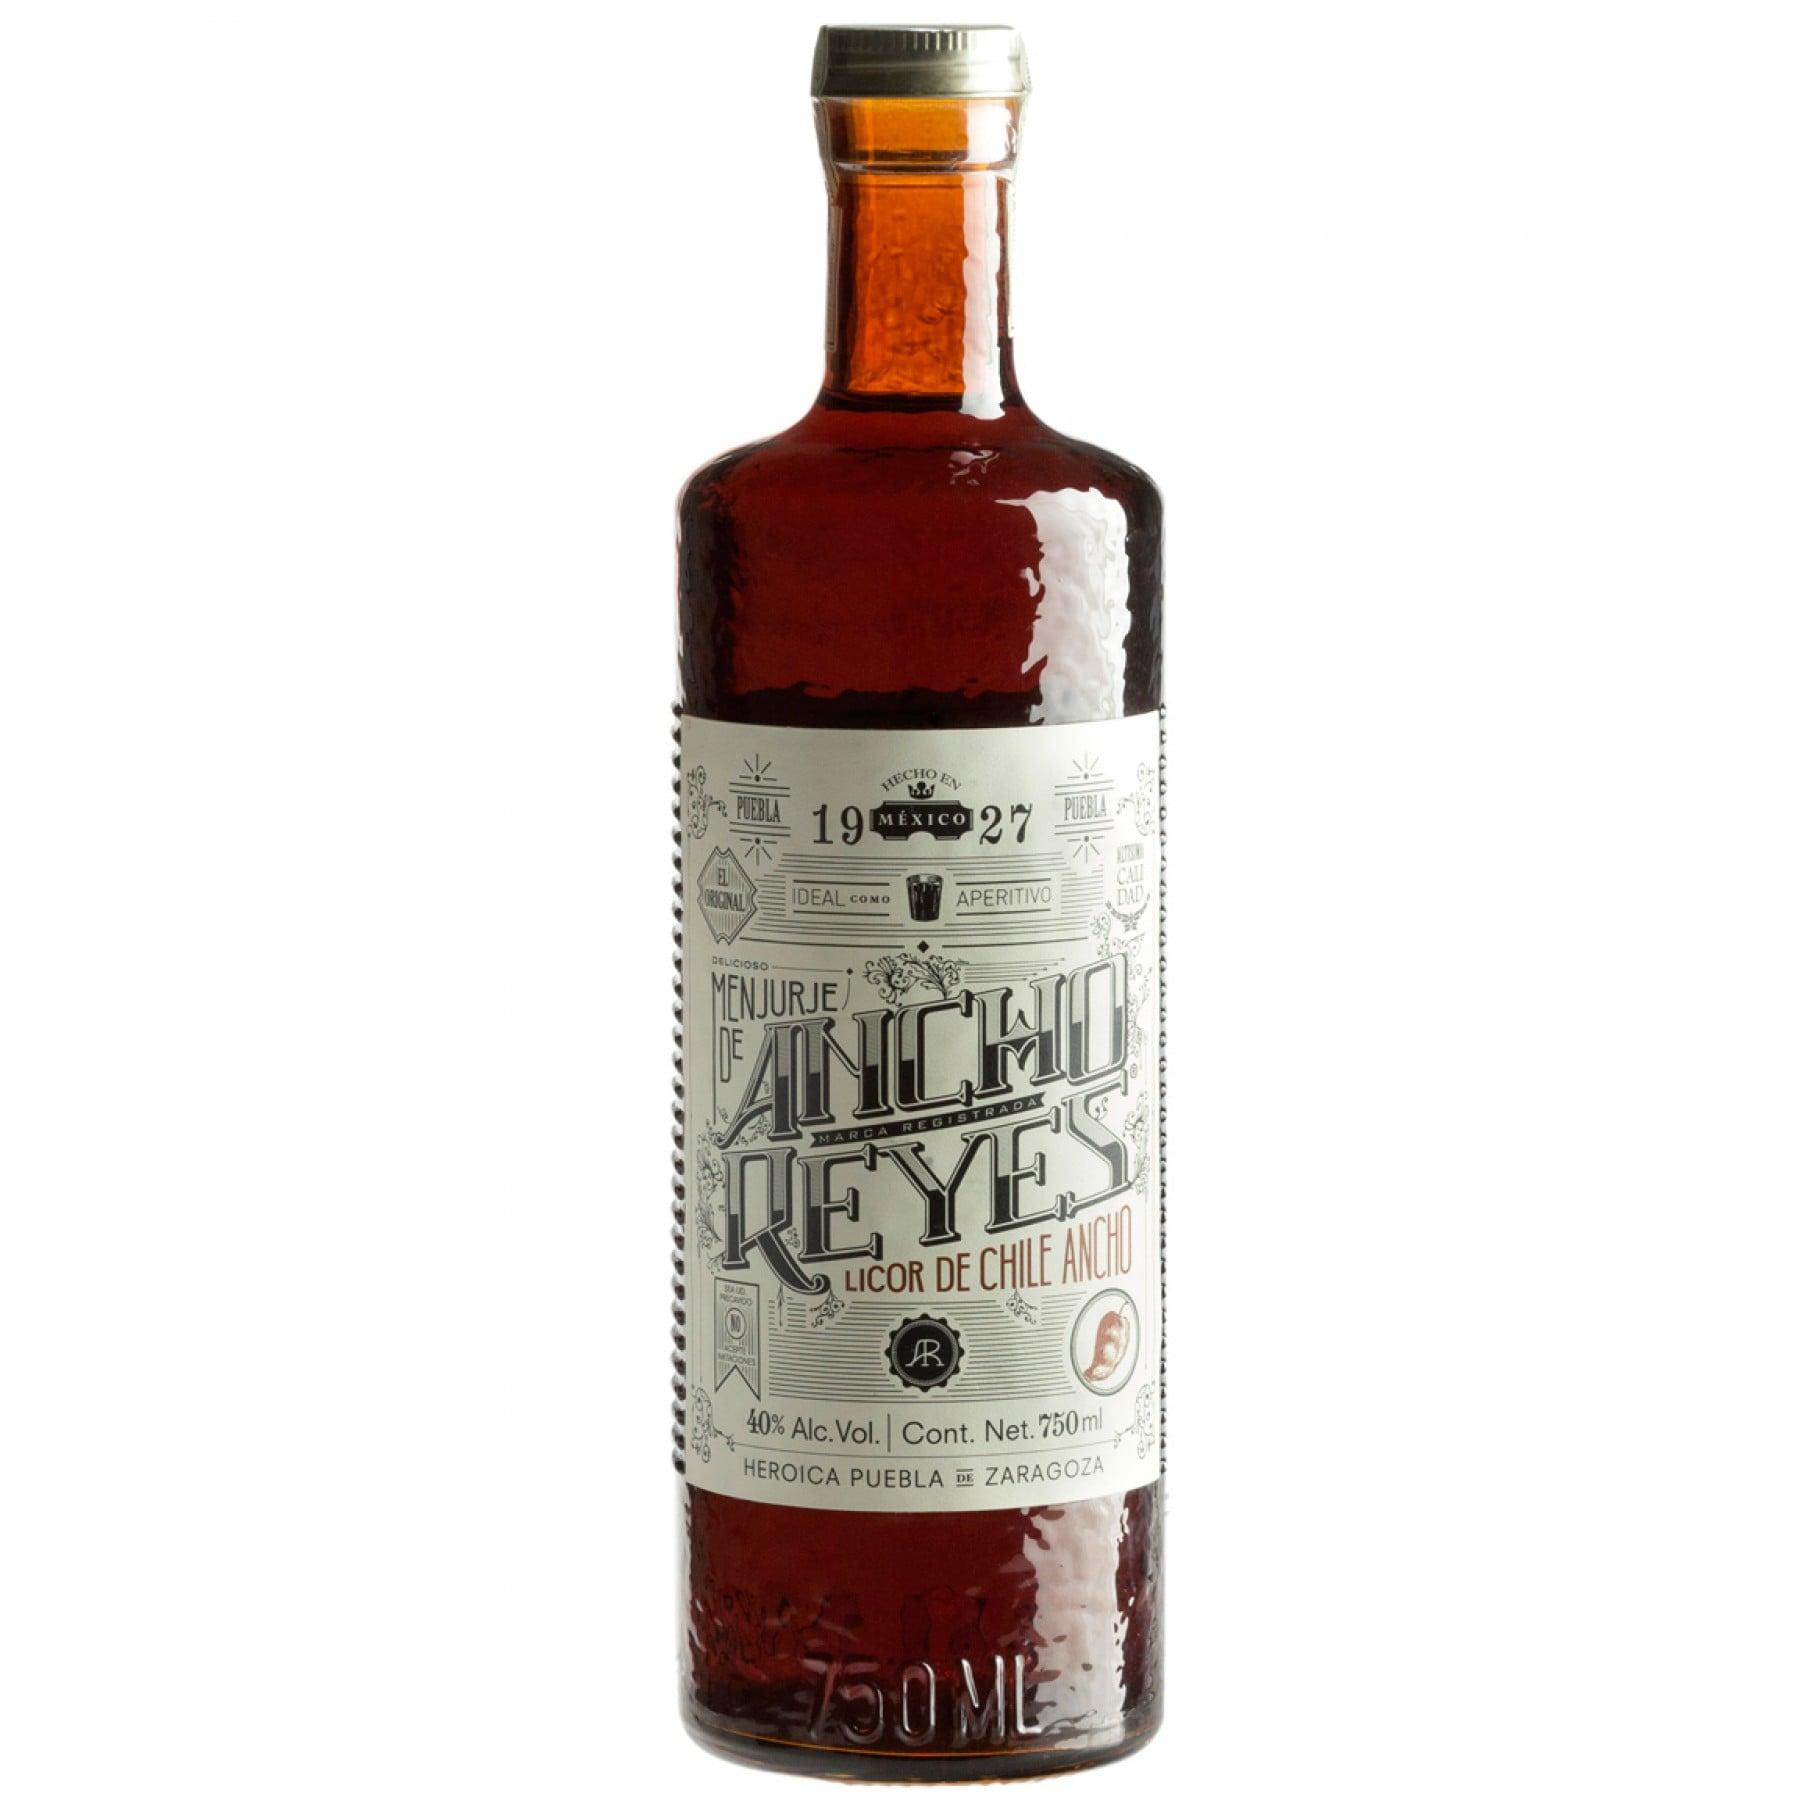 Ancho Reyes Liquor